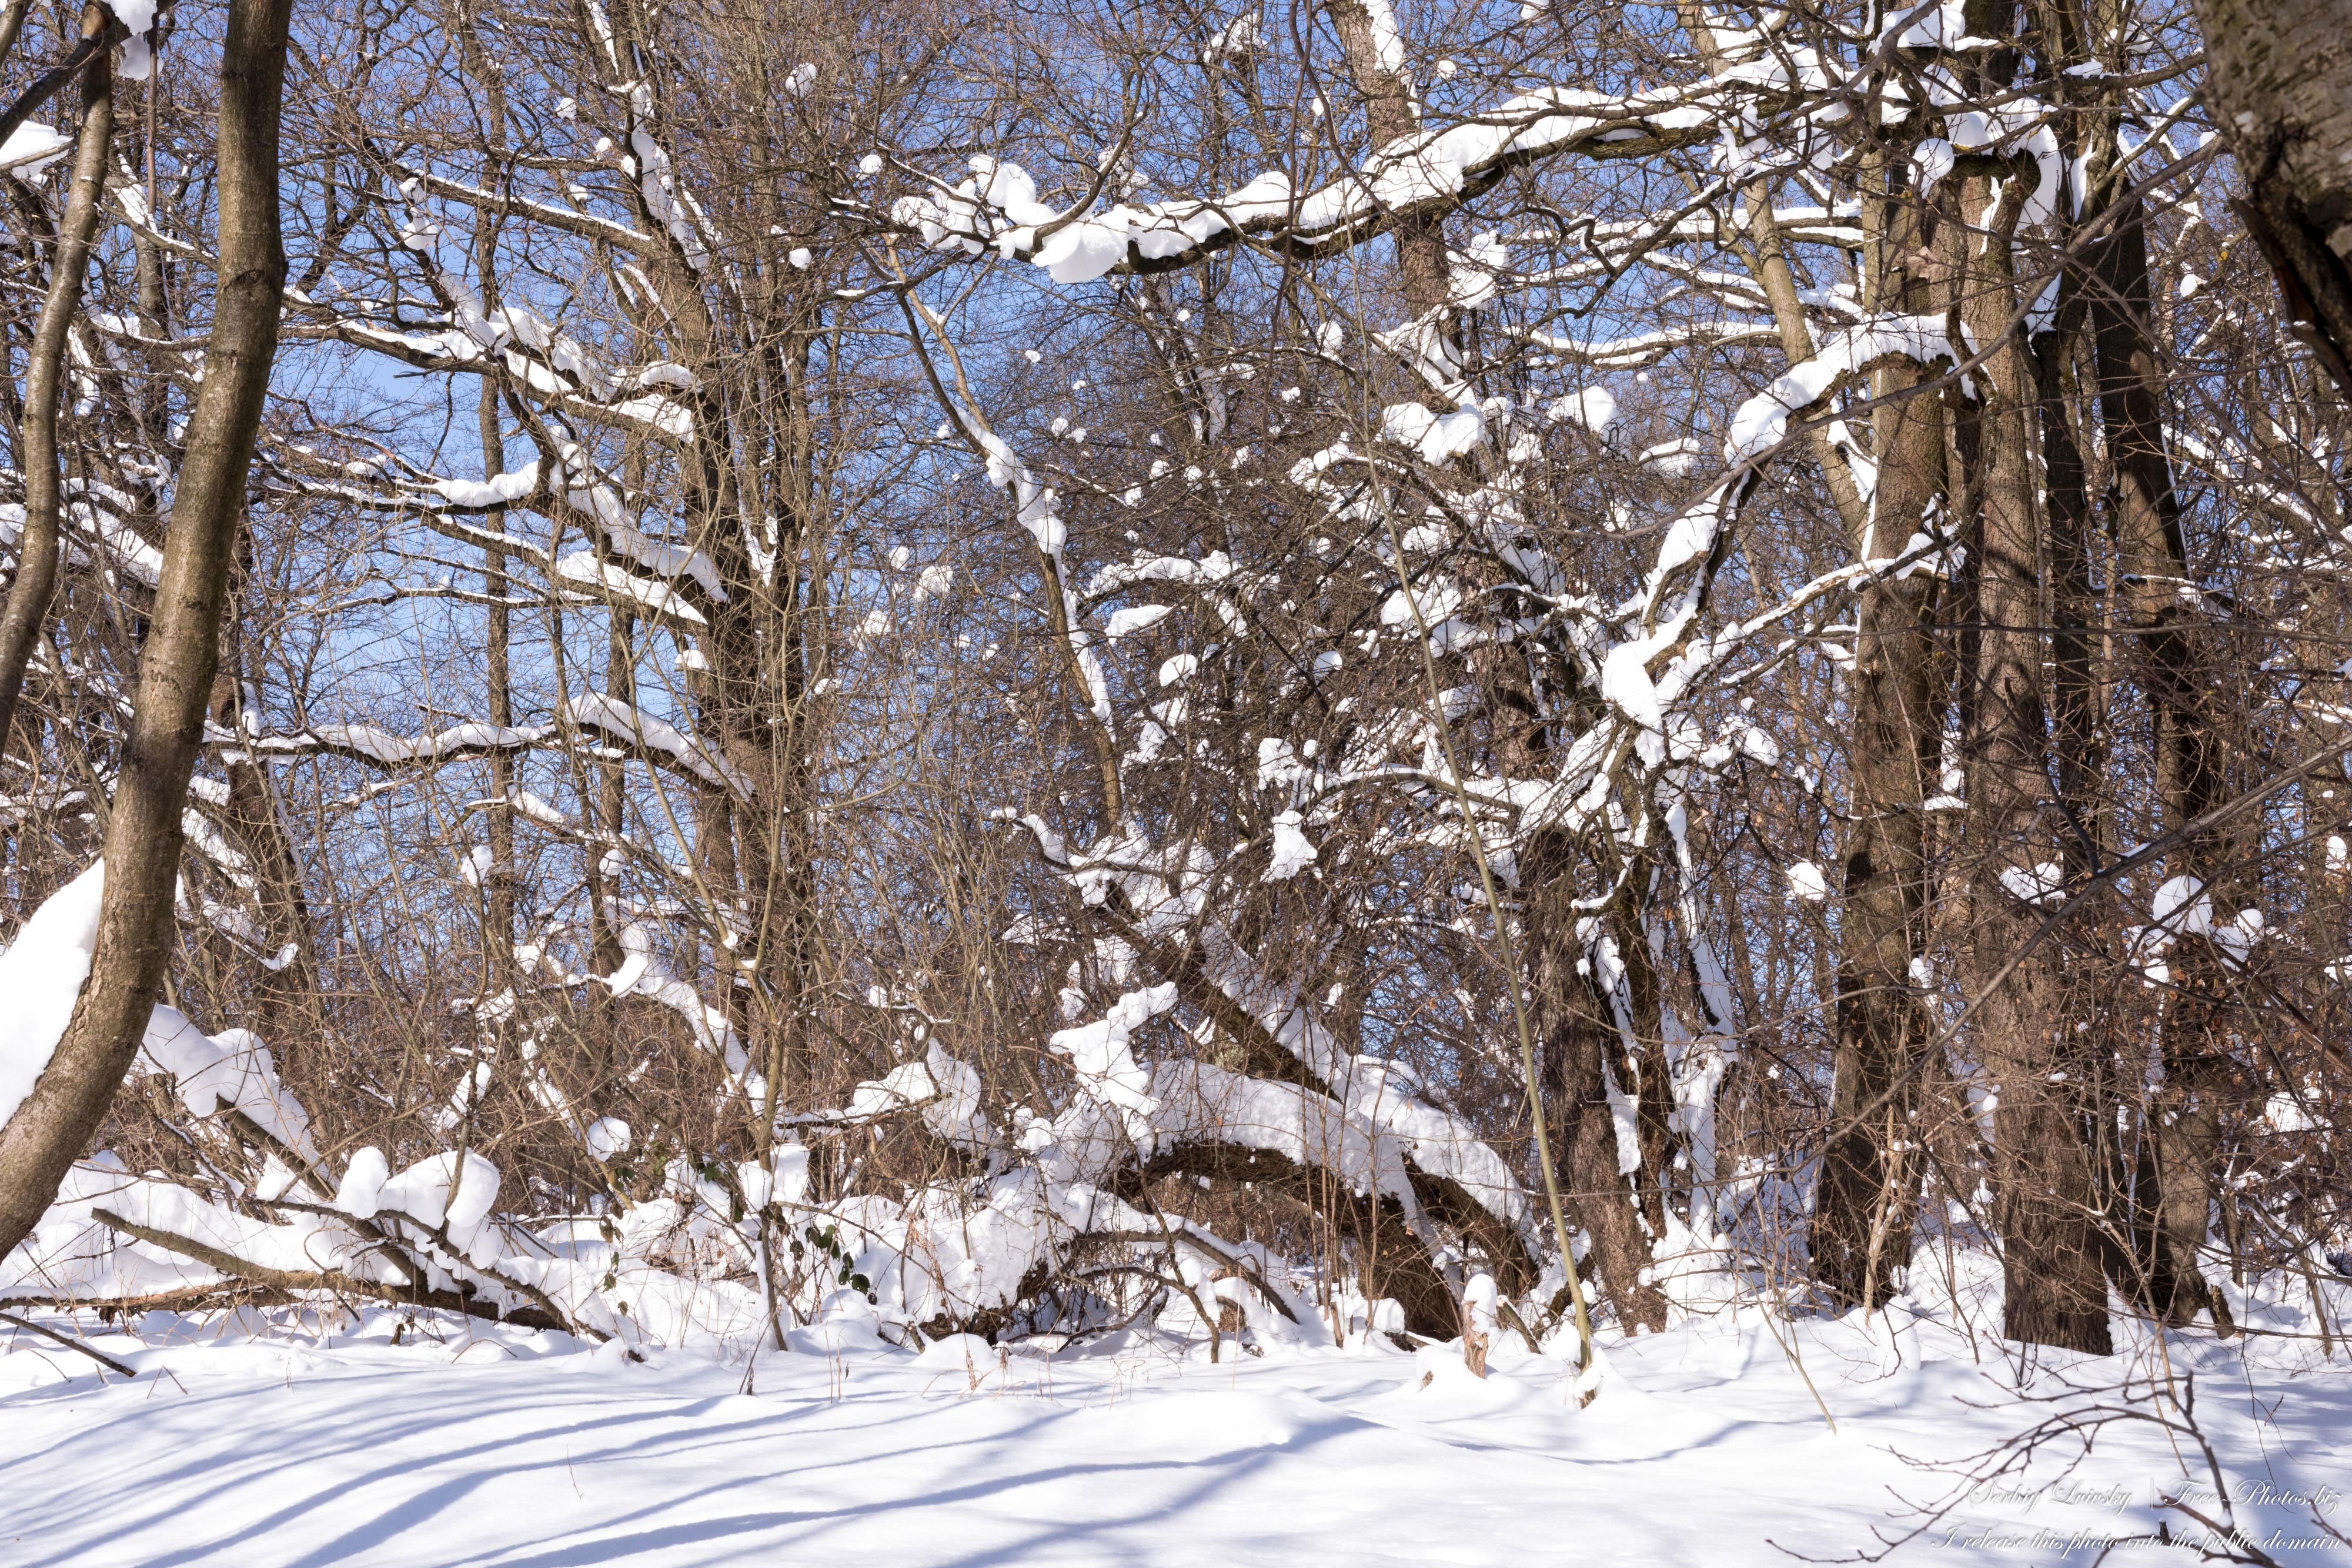 a_sunny_winter_day_in_lviv_region_of_ukraine_in_feb_2021_by_serhiy_lvivsky_10